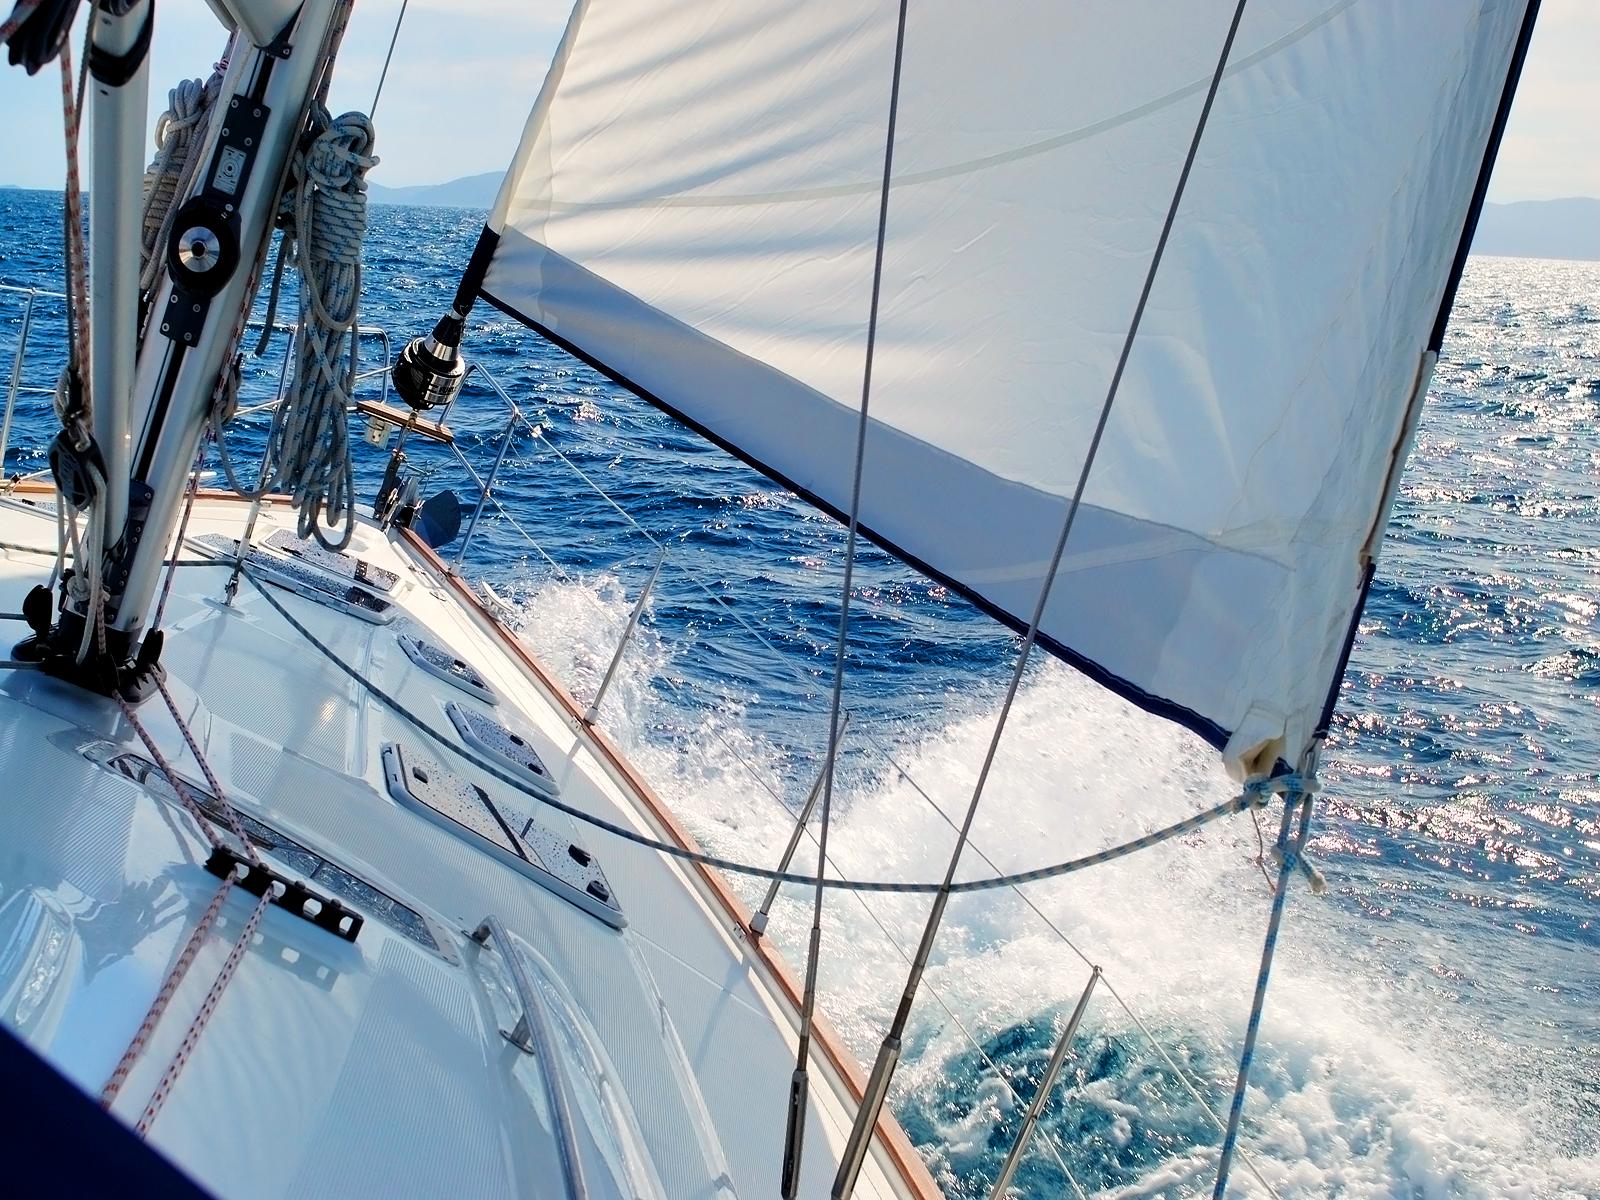 Sailboat Holiday Summer 4k Hd Desktop Wallpaper For 4k: The Republican Stellar Record